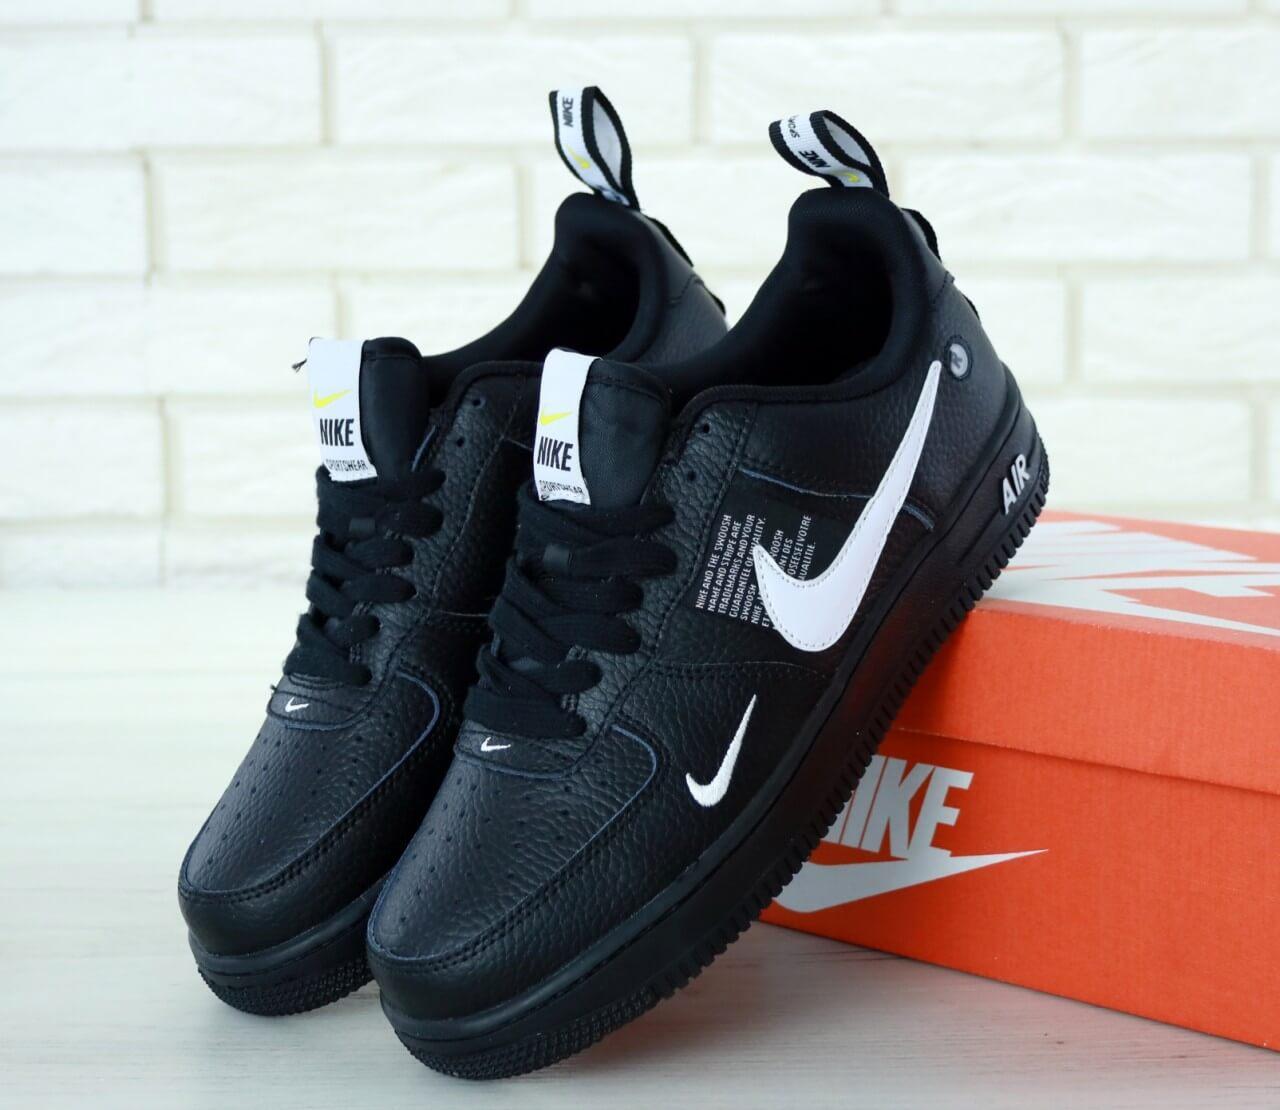 Модные мужские кроссовки Nike Air Force 1 07 LV8 Utility - Интернет магазин  обуви «im edd67f6f2dc4d